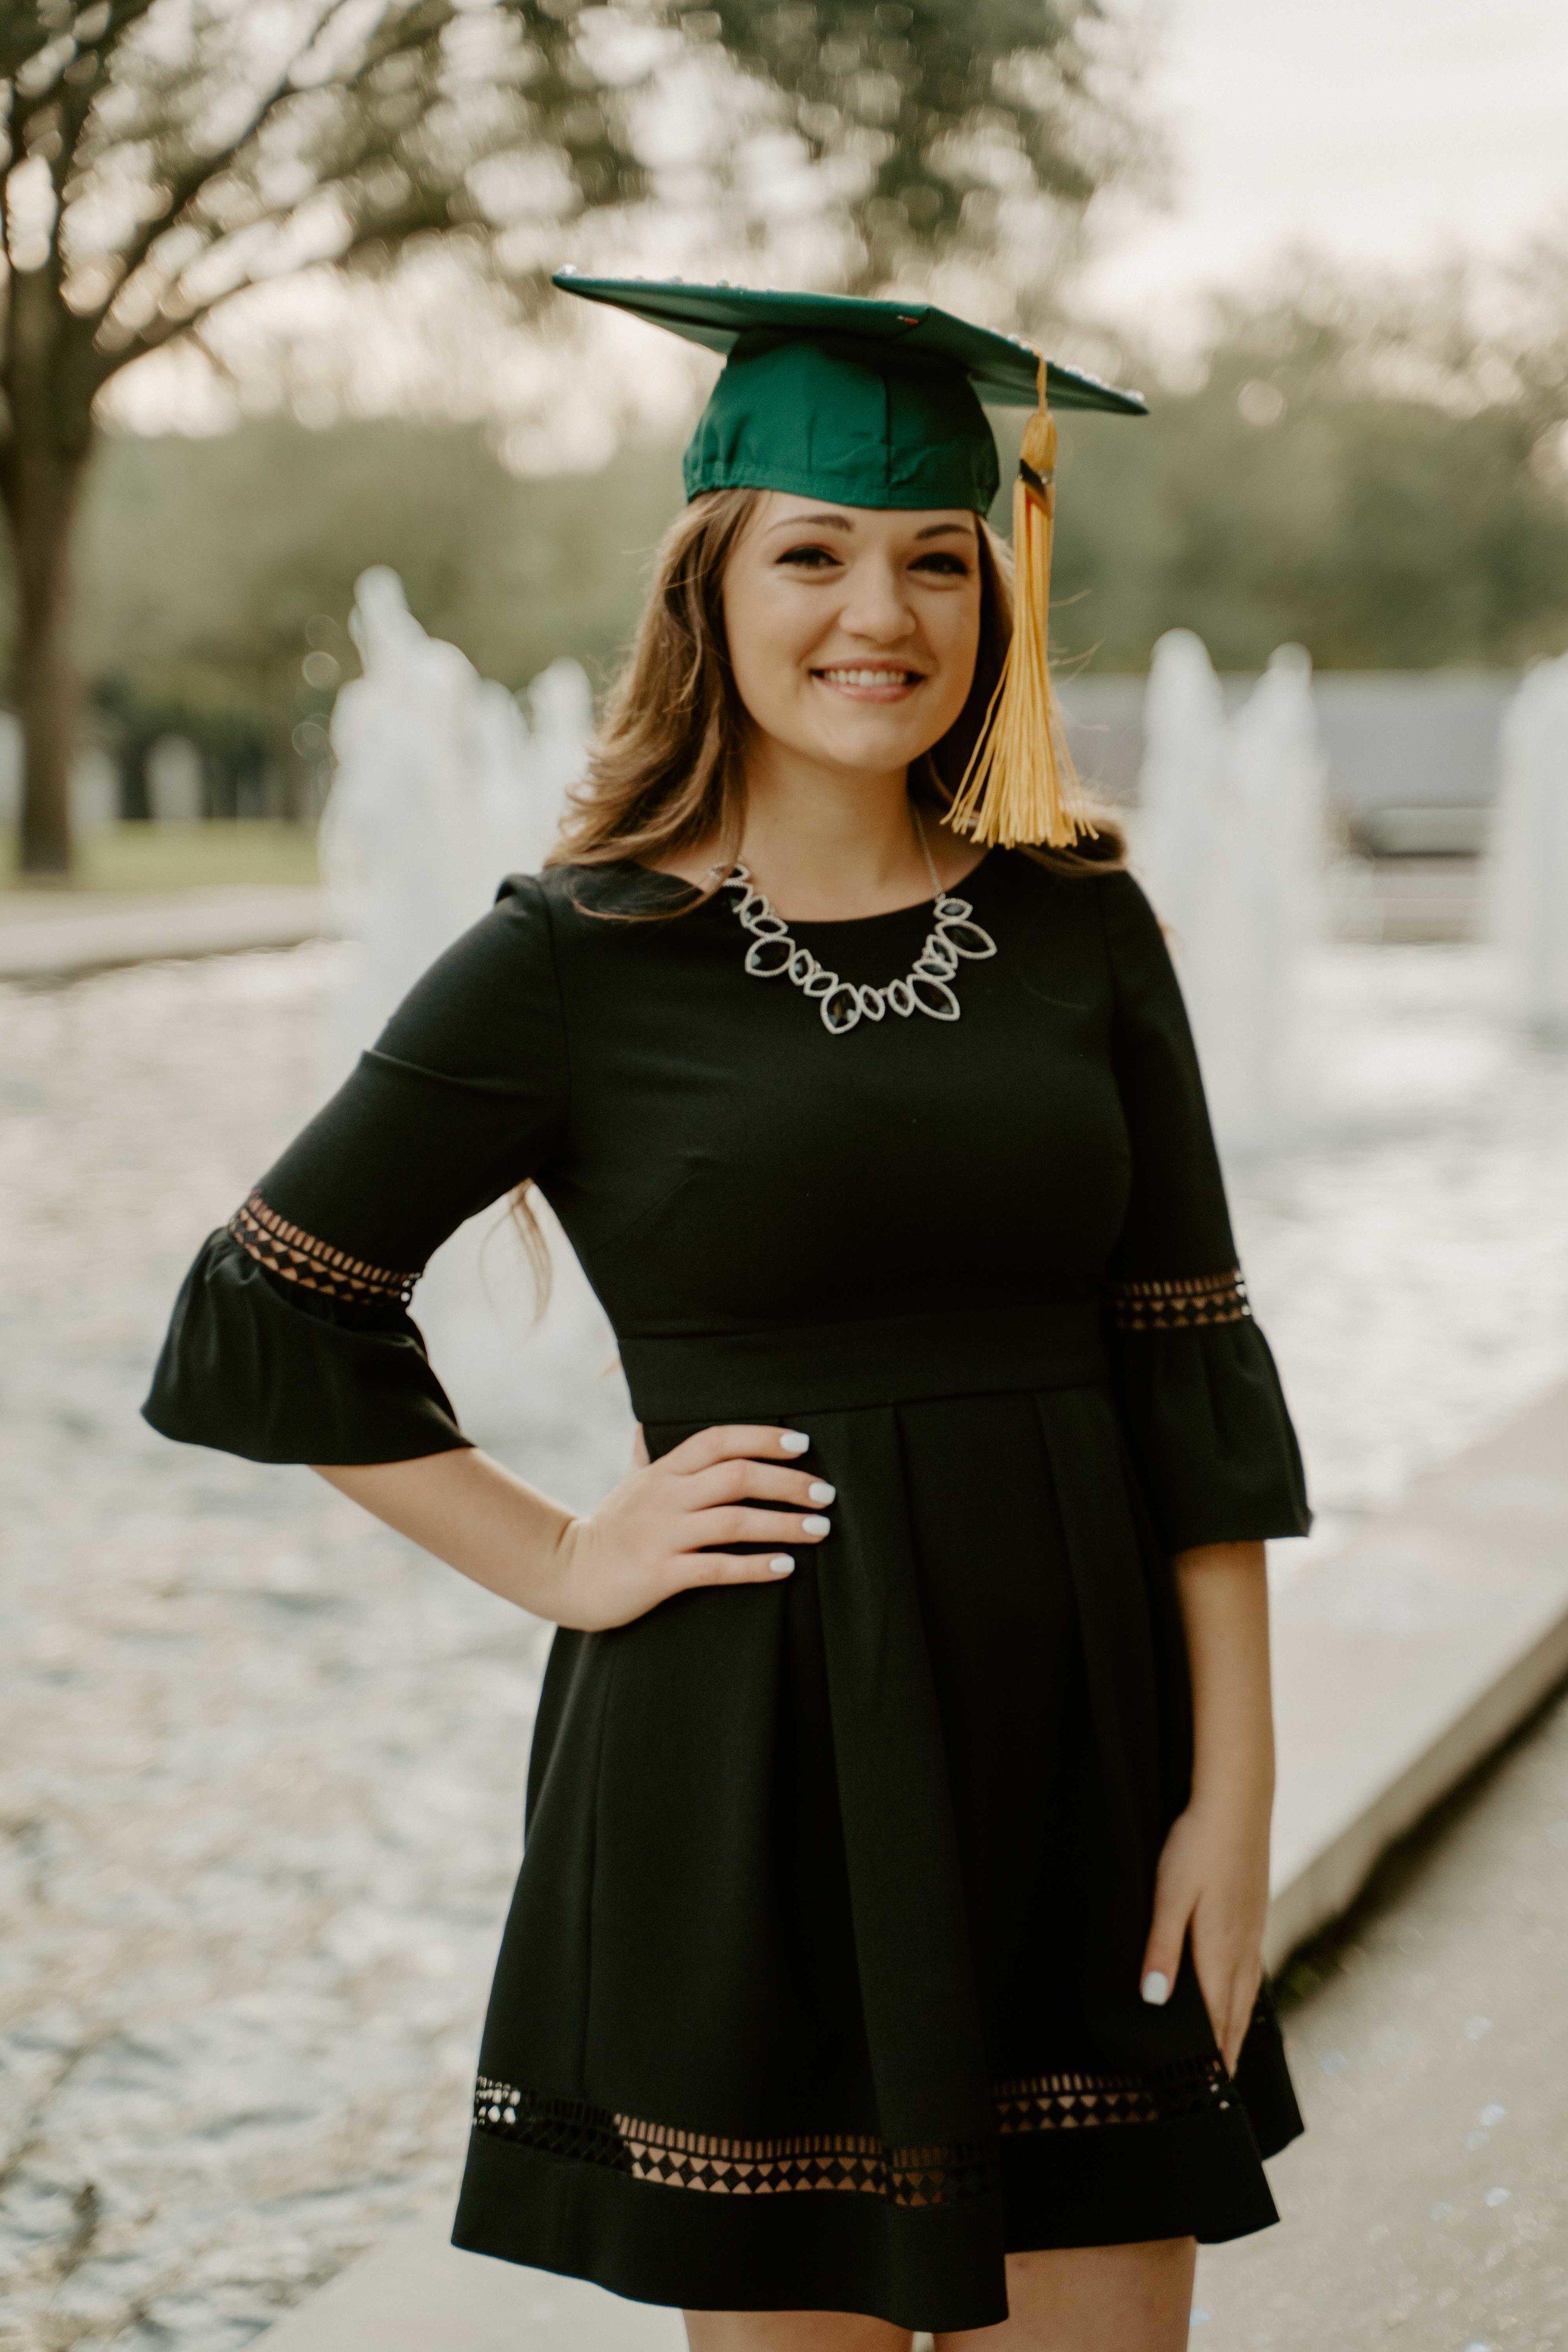 University-Of-South-Florida-Graduation-Session-Florida-Senior-Photographer-USF-Graduation